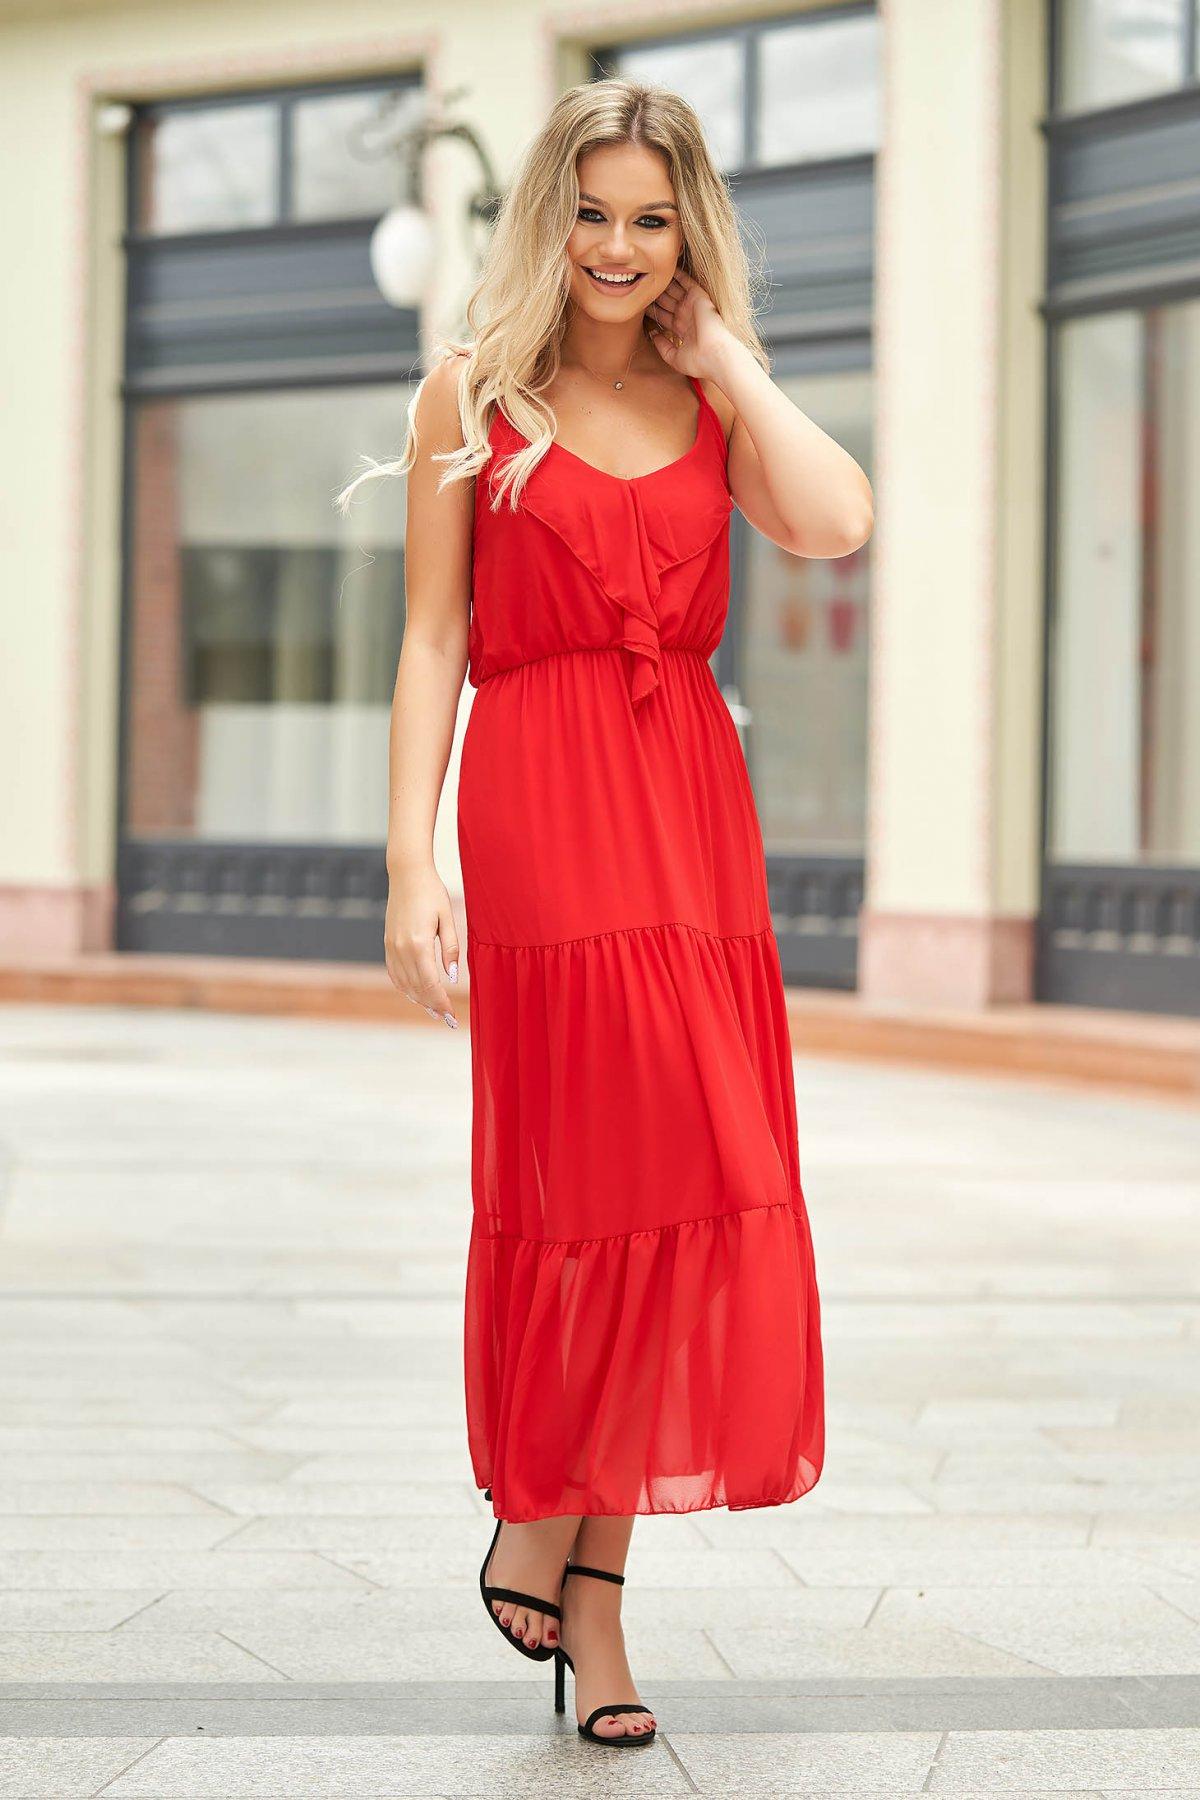 Rochie rosie lunga de zi din voal fara maneci cu volanase SunShine